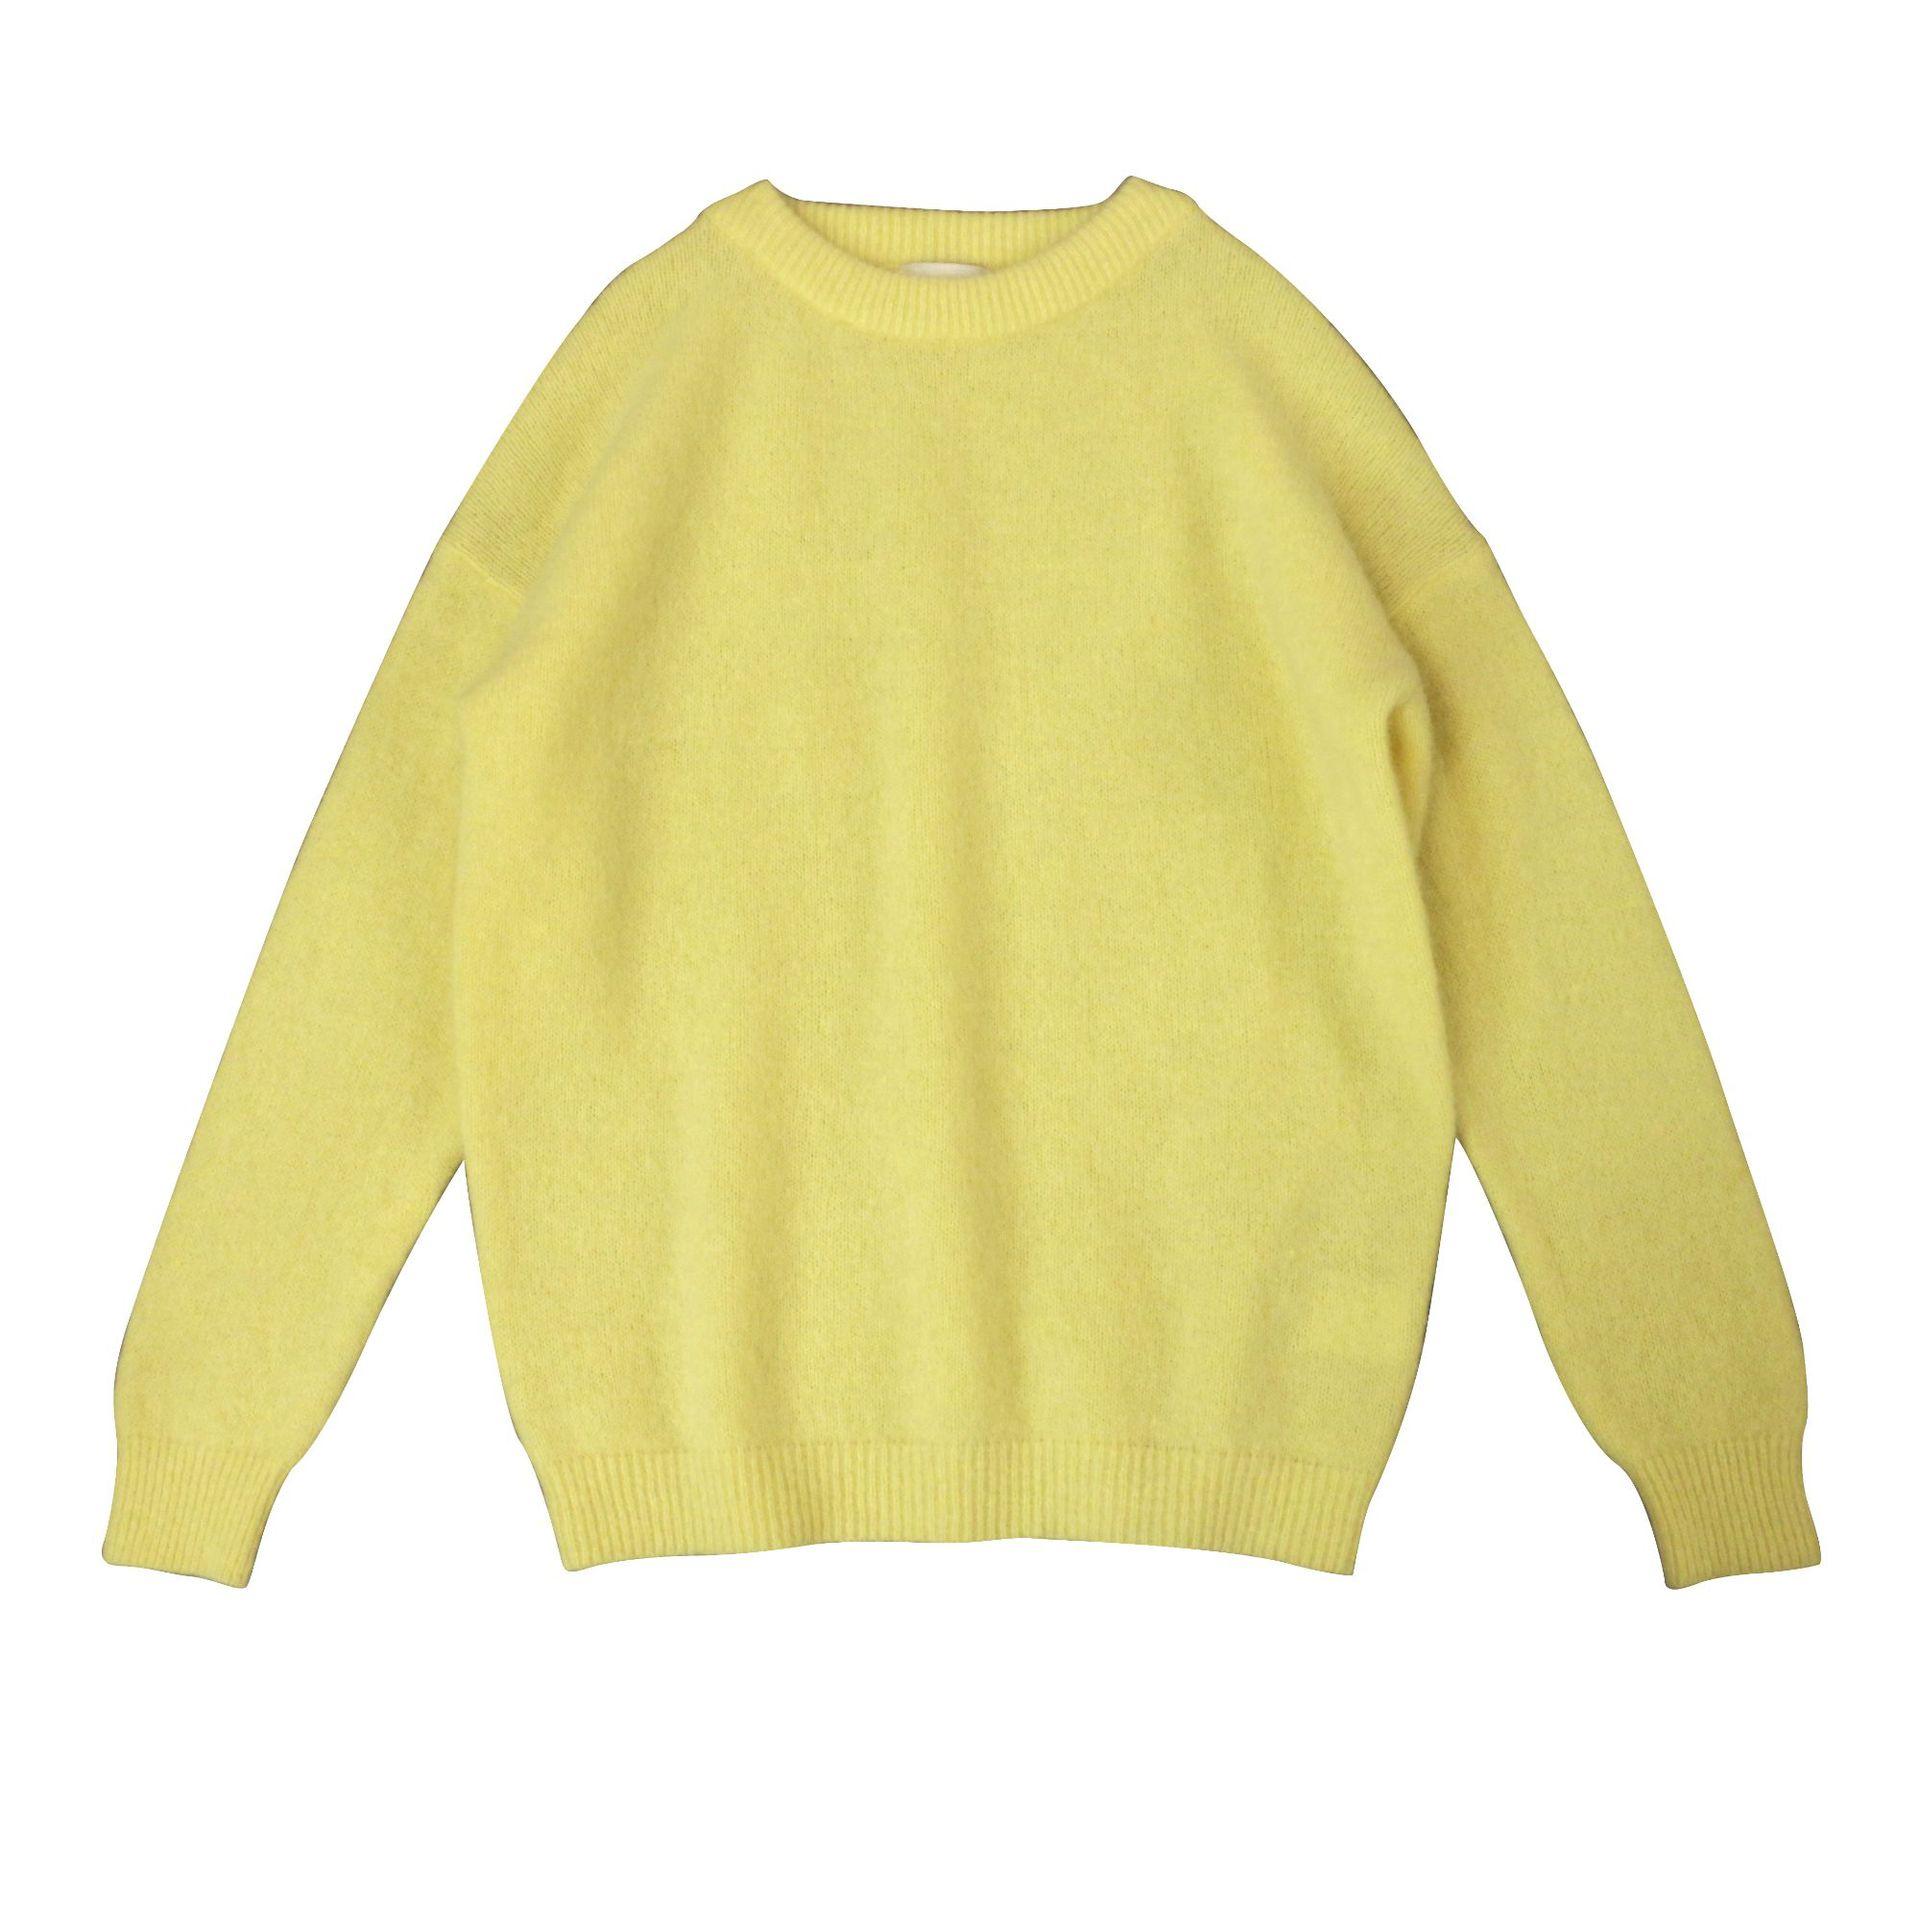 SHUCHAN Yellow SWEATER WOMEN 34% Mohair Free Shipping Items Clothes for Women Streetwear Women Clothes Korean Fashion